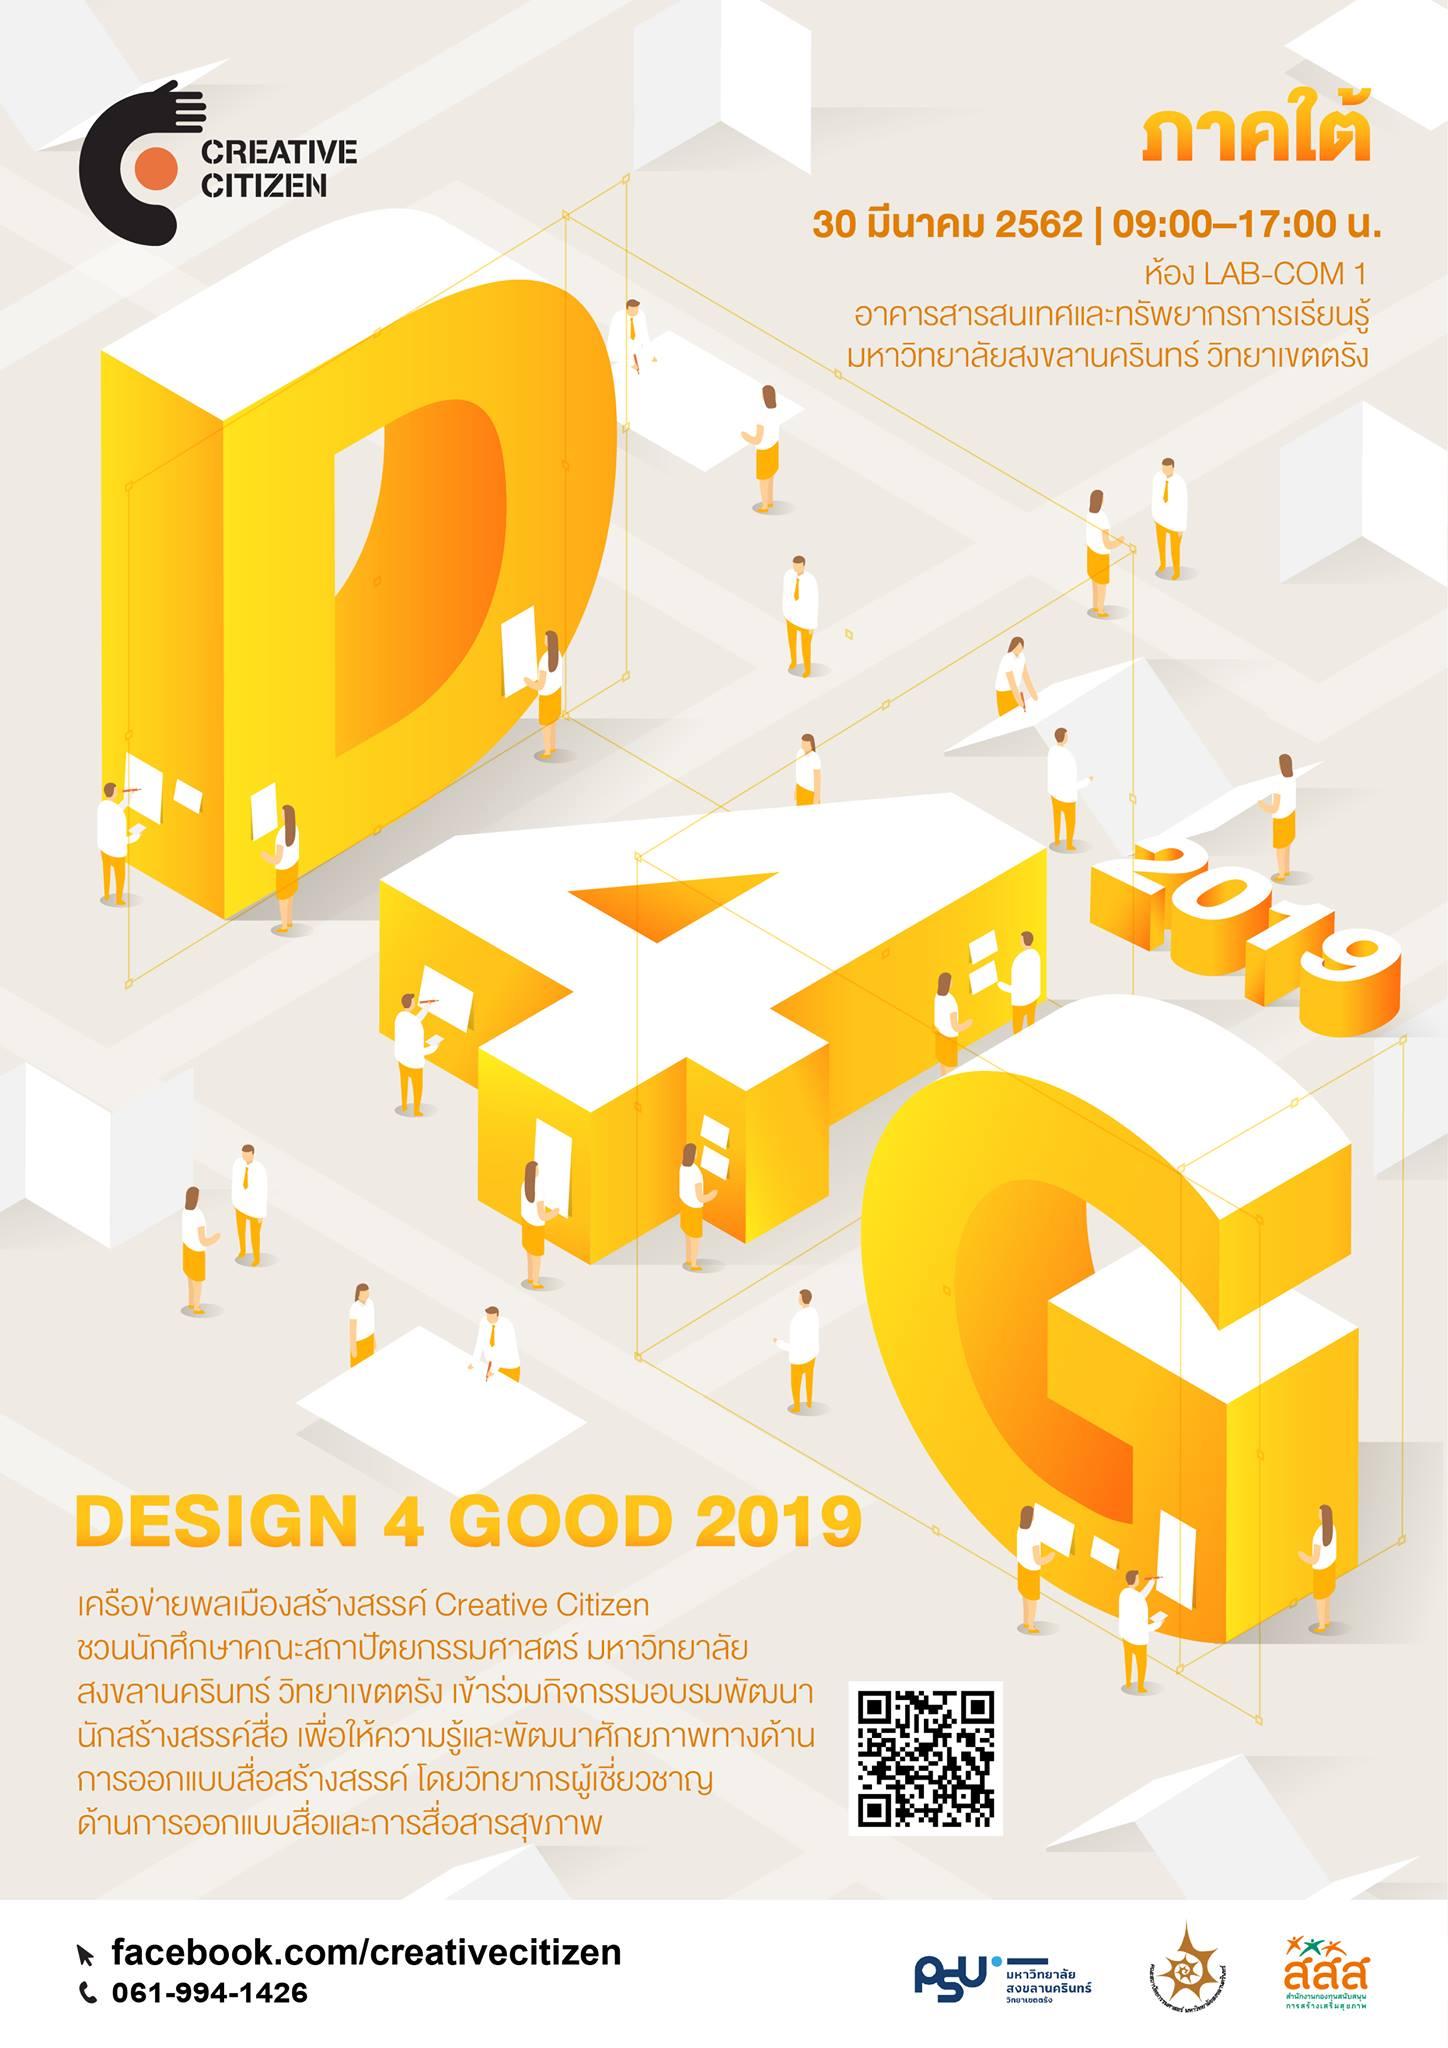 Design 4 Good – ภาคใต้ (มหาวิทยาลัยสงขลานครินทร์ วิทยาเขตตรัง)